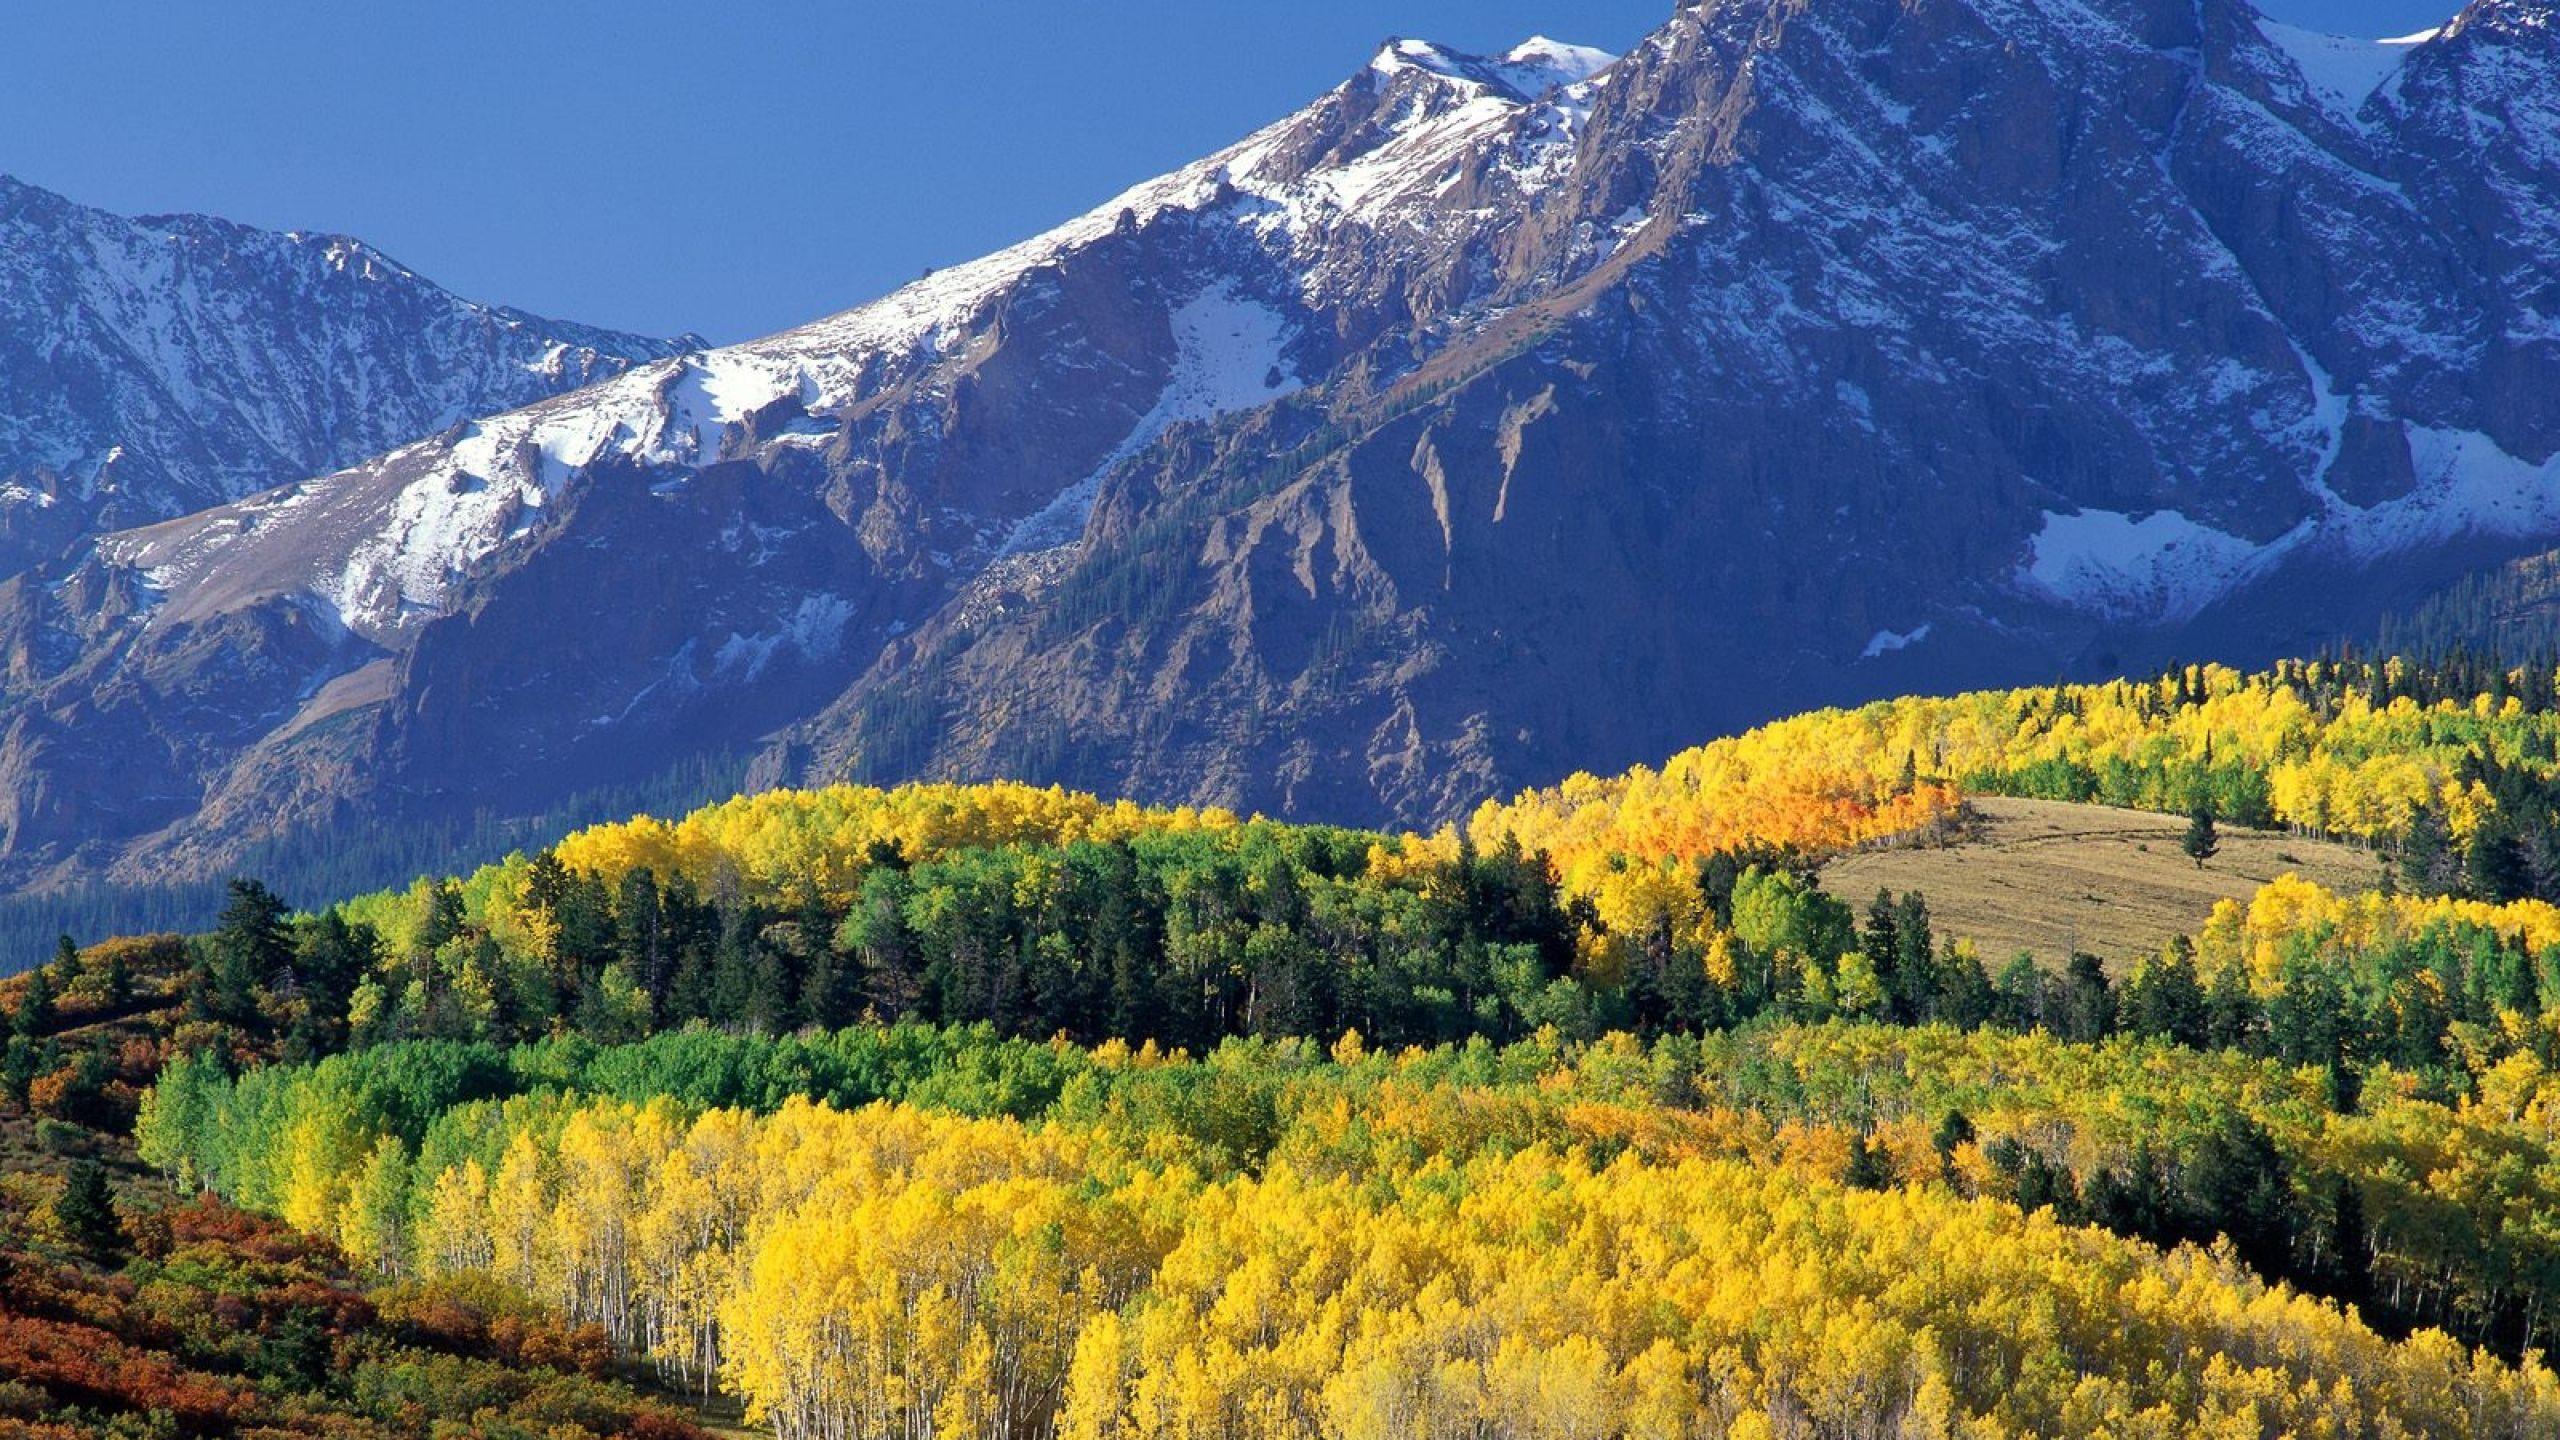 Download Wallpaper 2560x1440 Mount Sneffels Colorado Wood Mountains Autumn Mac Imac 27 Hd Background Scenery Pictures Landscape Trees Landscape